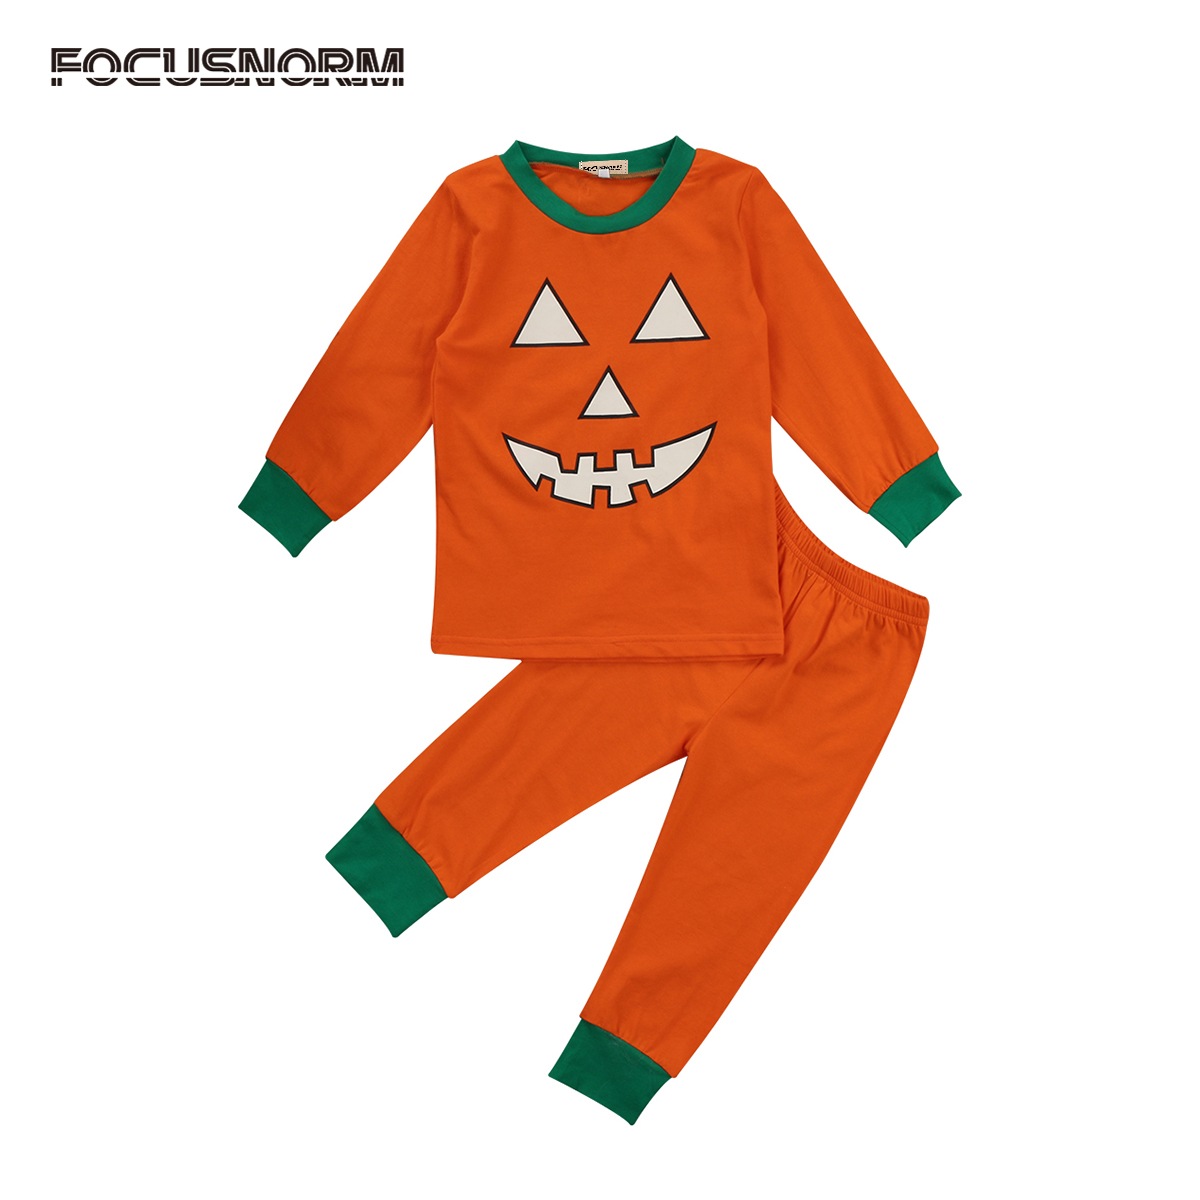 Halloween Newborn Clothing Sets Pumpkin Toddler Baby Kids Girl Warm Autumn Winter Clothes Playsuit Pants Outfit Set halloween orange top ruffle bow pumpkin satin trim skirt girl outfit set nb 8y mapsa0866